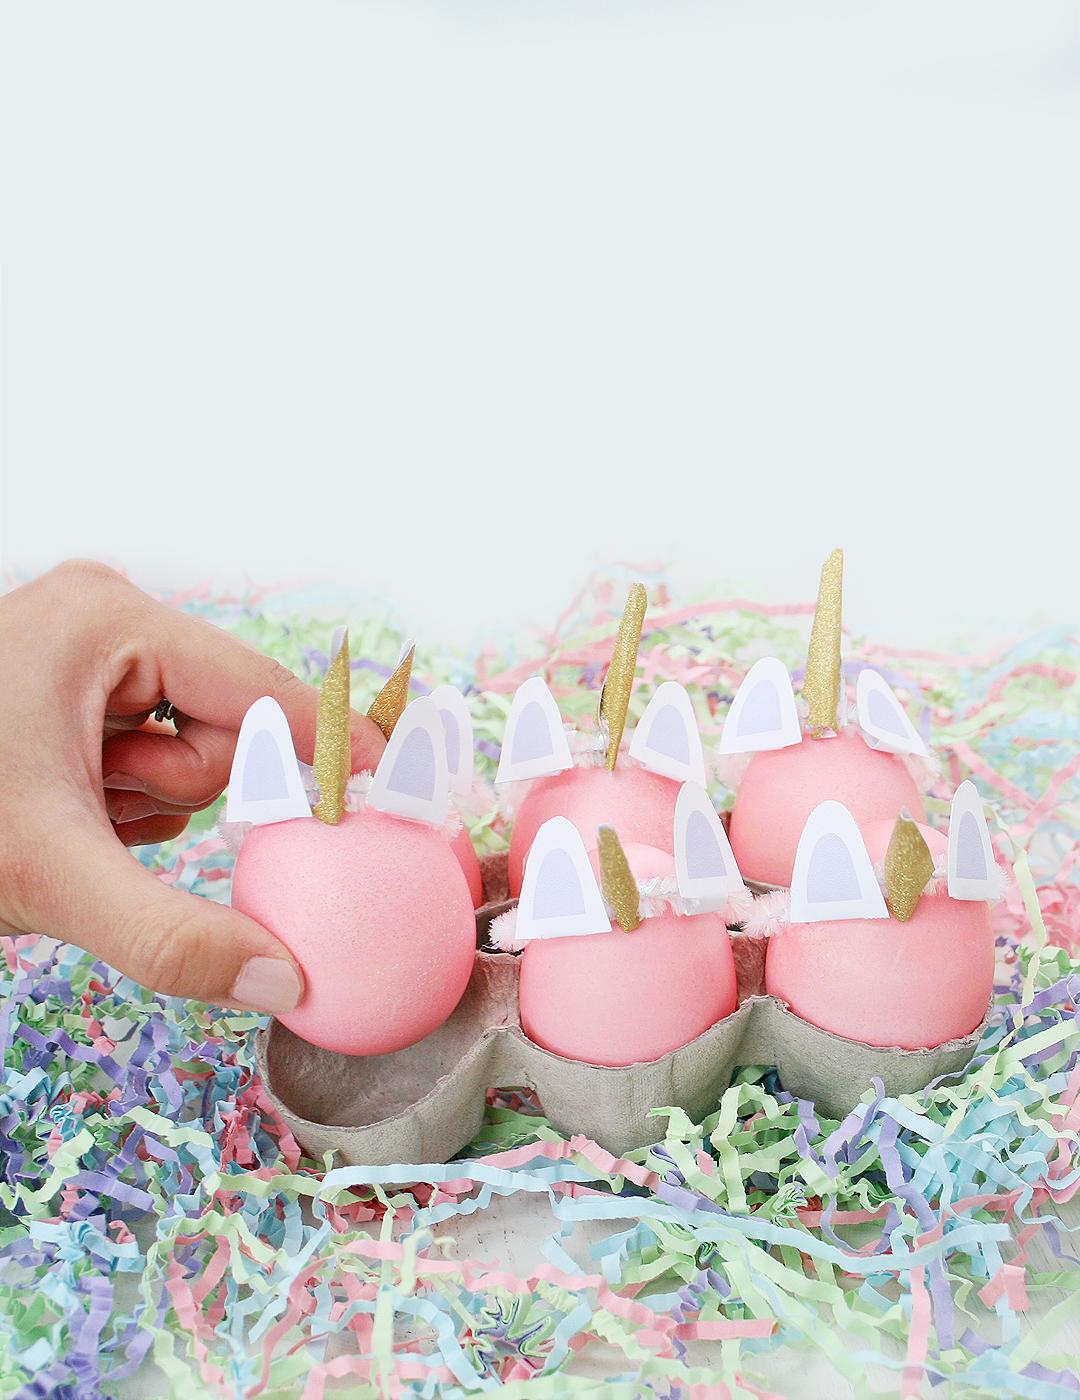 Ostereier bemalen mit Kindern - Einhorn Eier bemalen